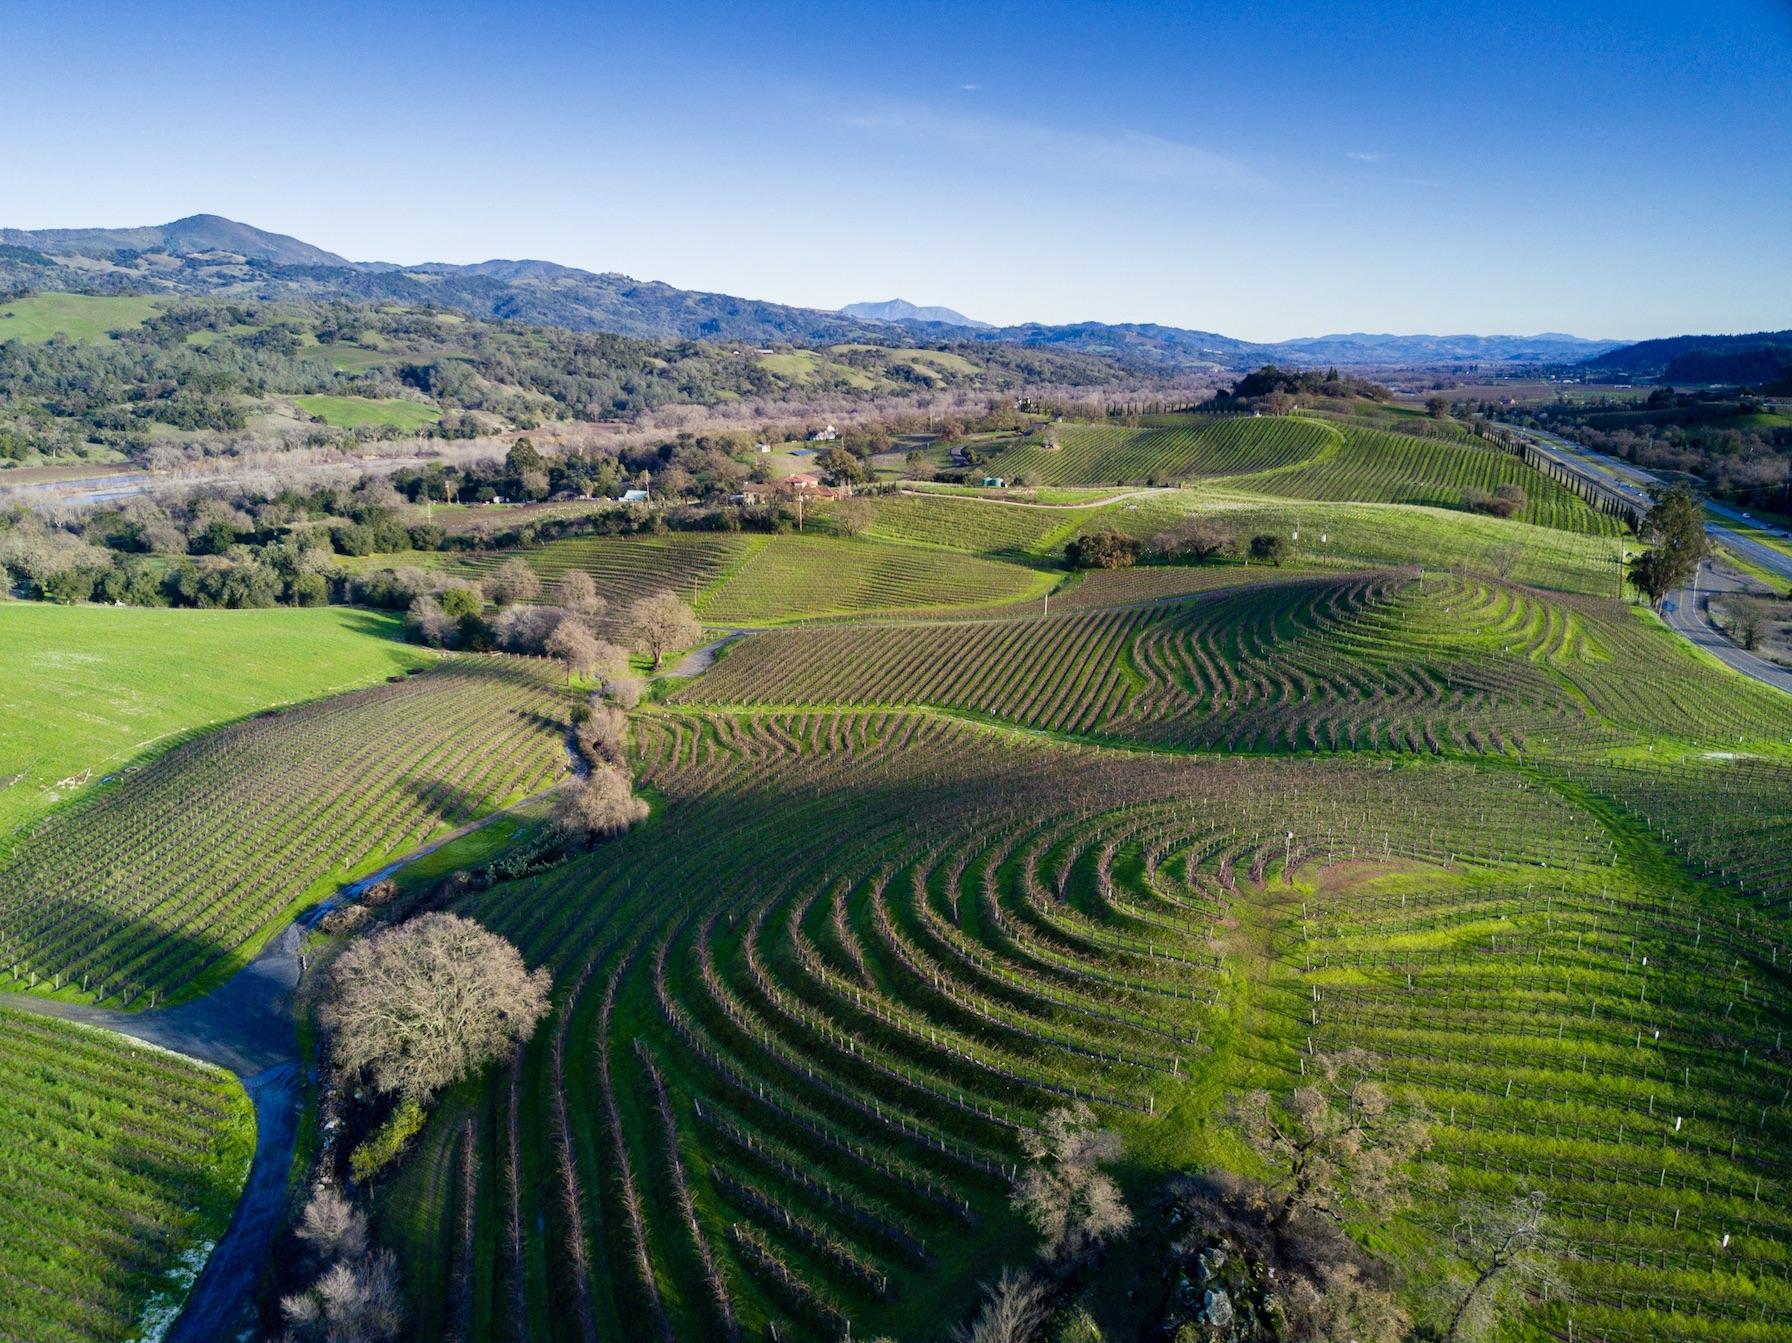 Northern California vineyards